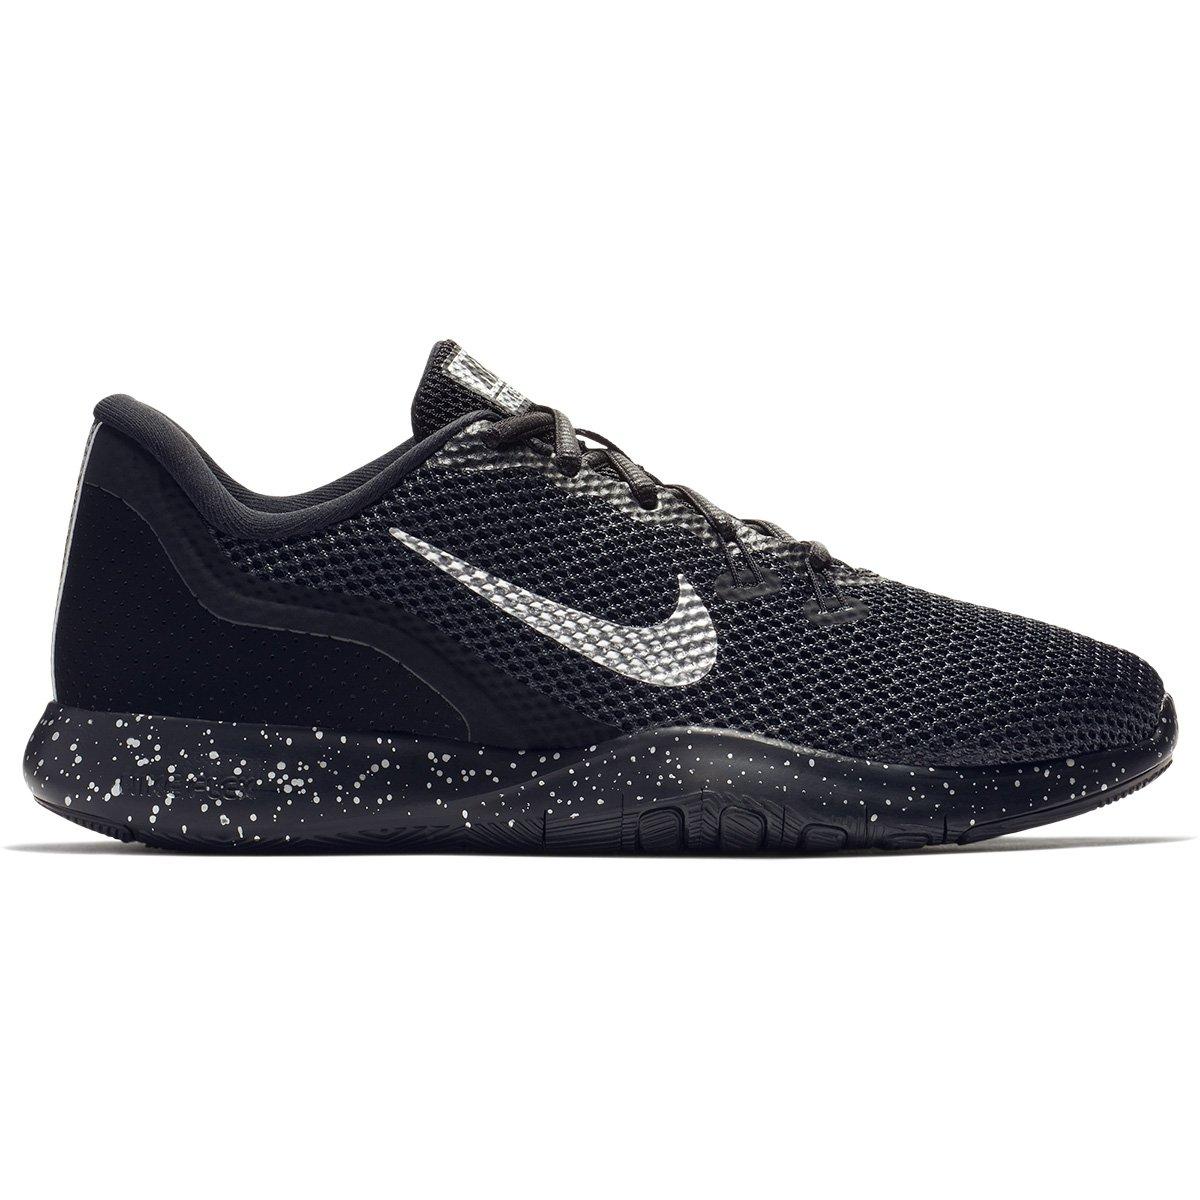 Tênis Nike Flex Trainer 7 PRM Feminino - Preto e Cinza - Compre ... 803d685272ab1